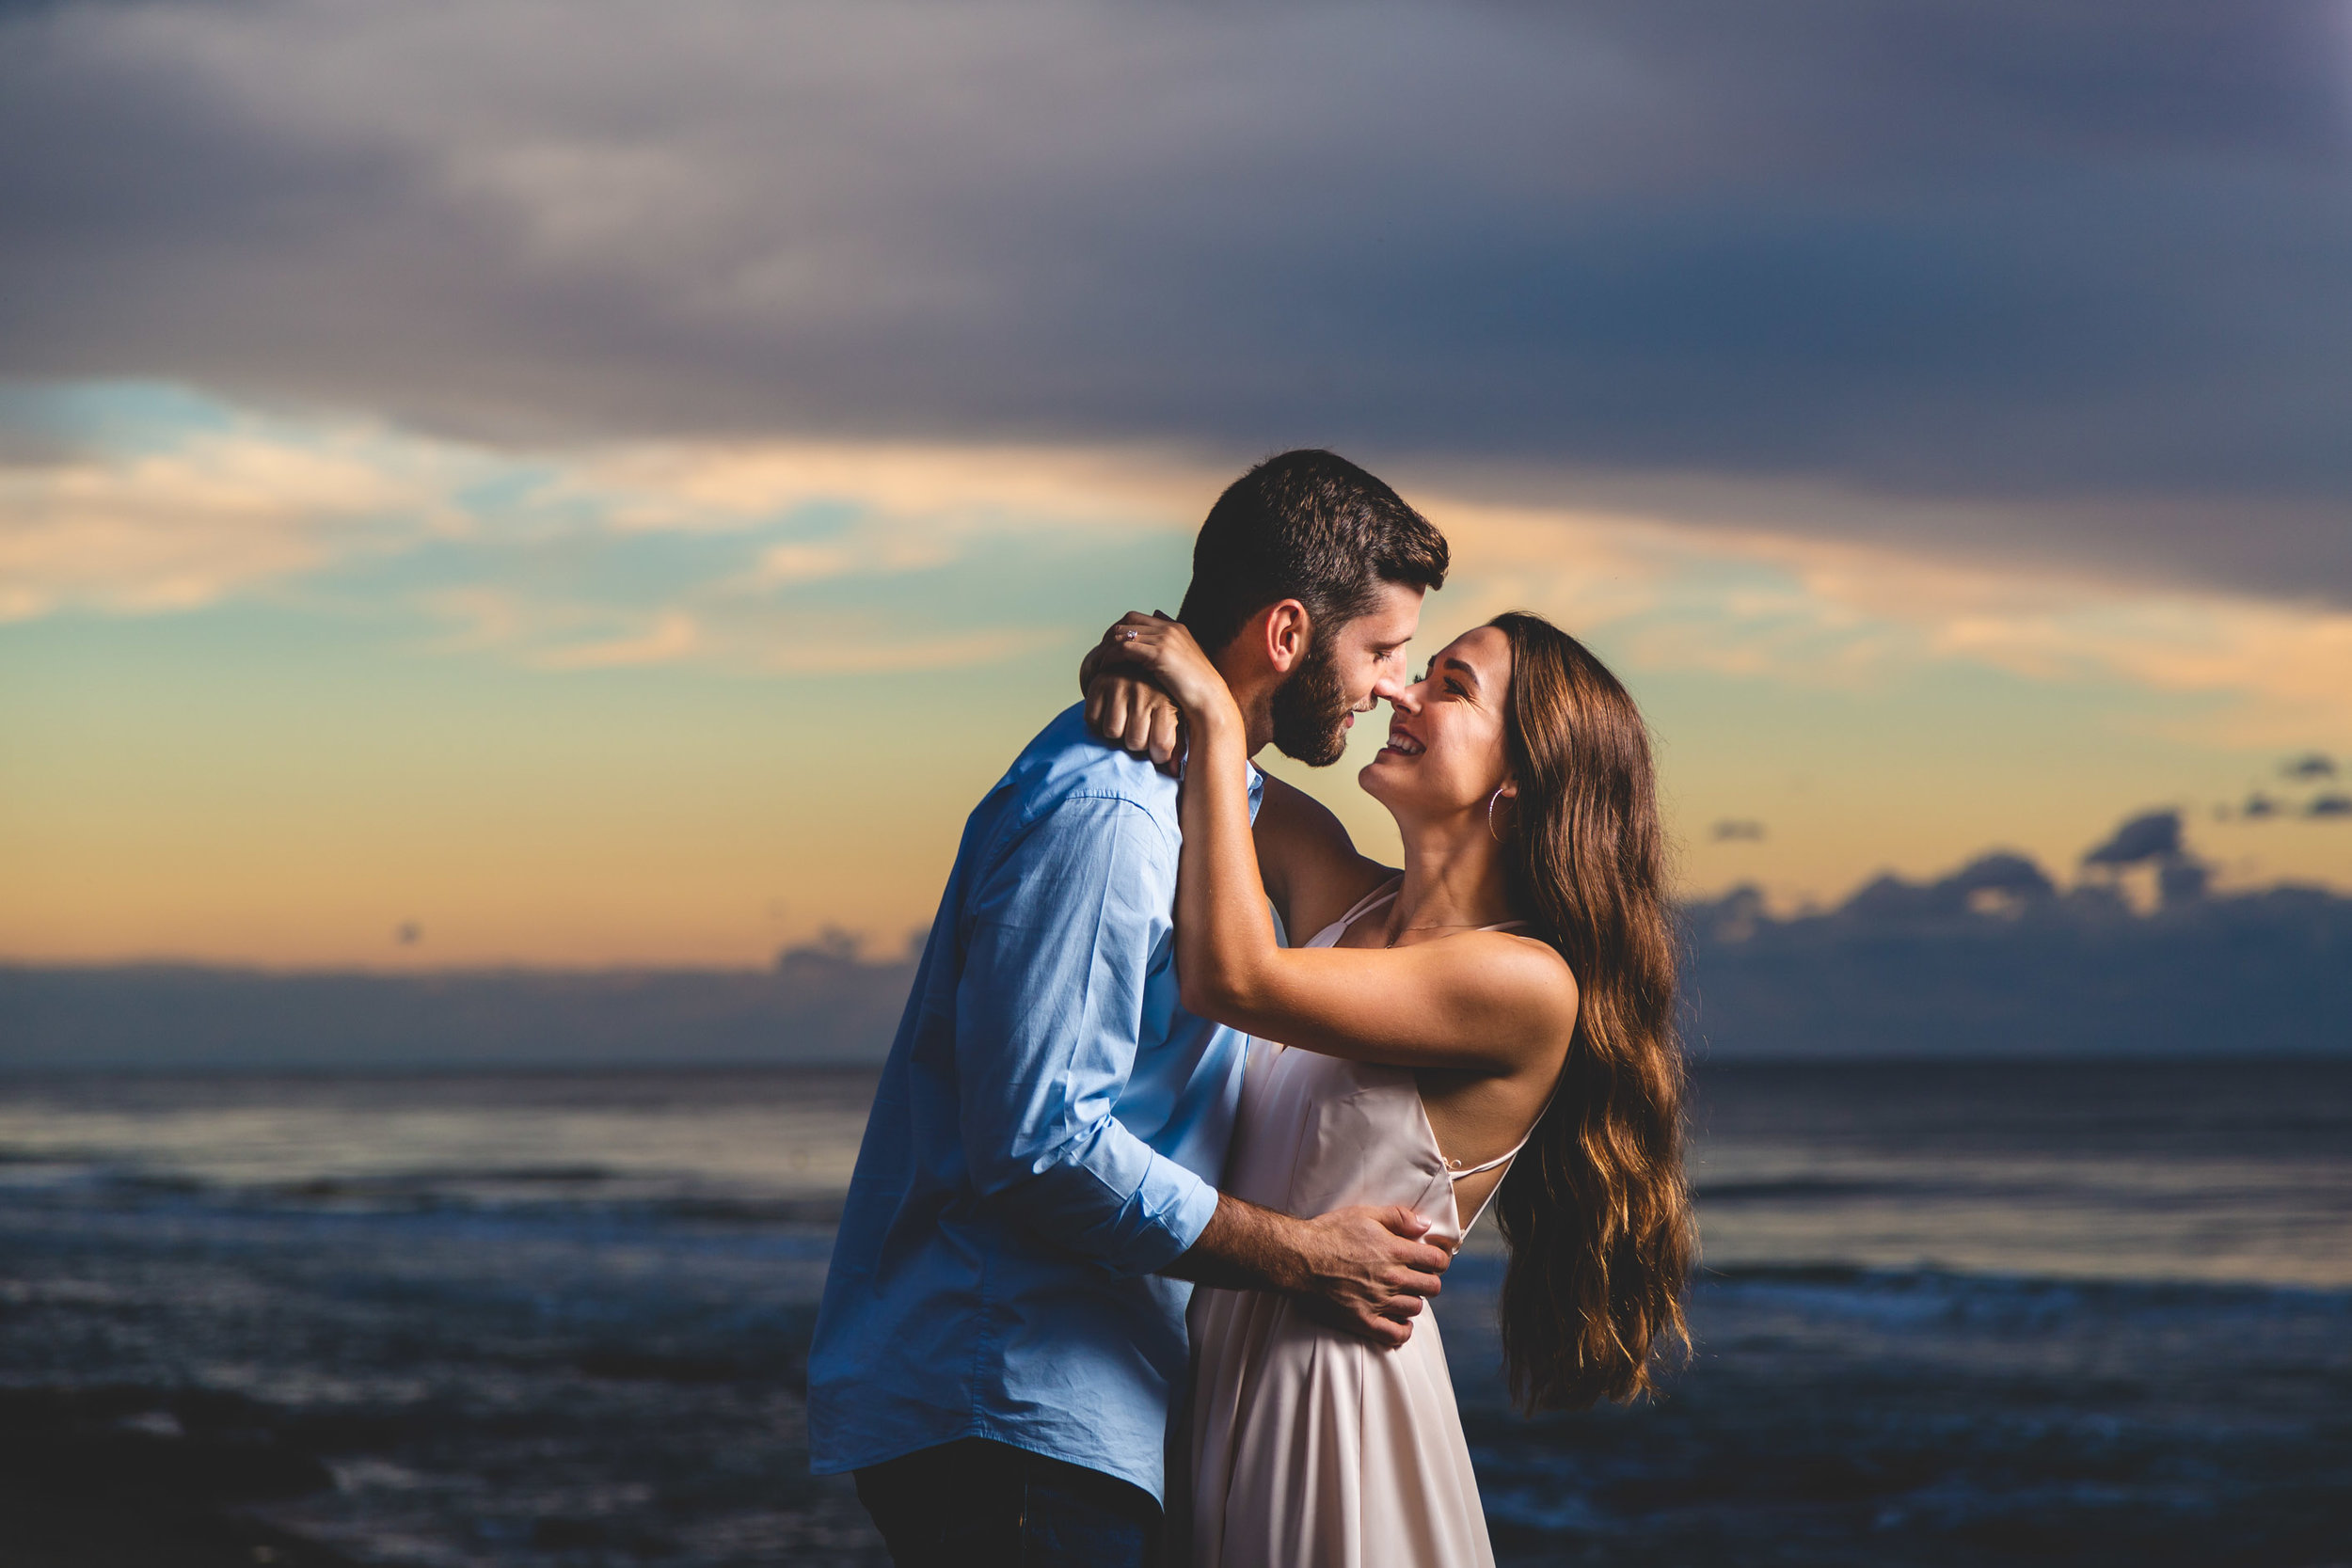 adam-szarmack-jacksonville-wedding-photographer-palm-coast-washing-oaks-garden-state-park-engagement-46.jpg